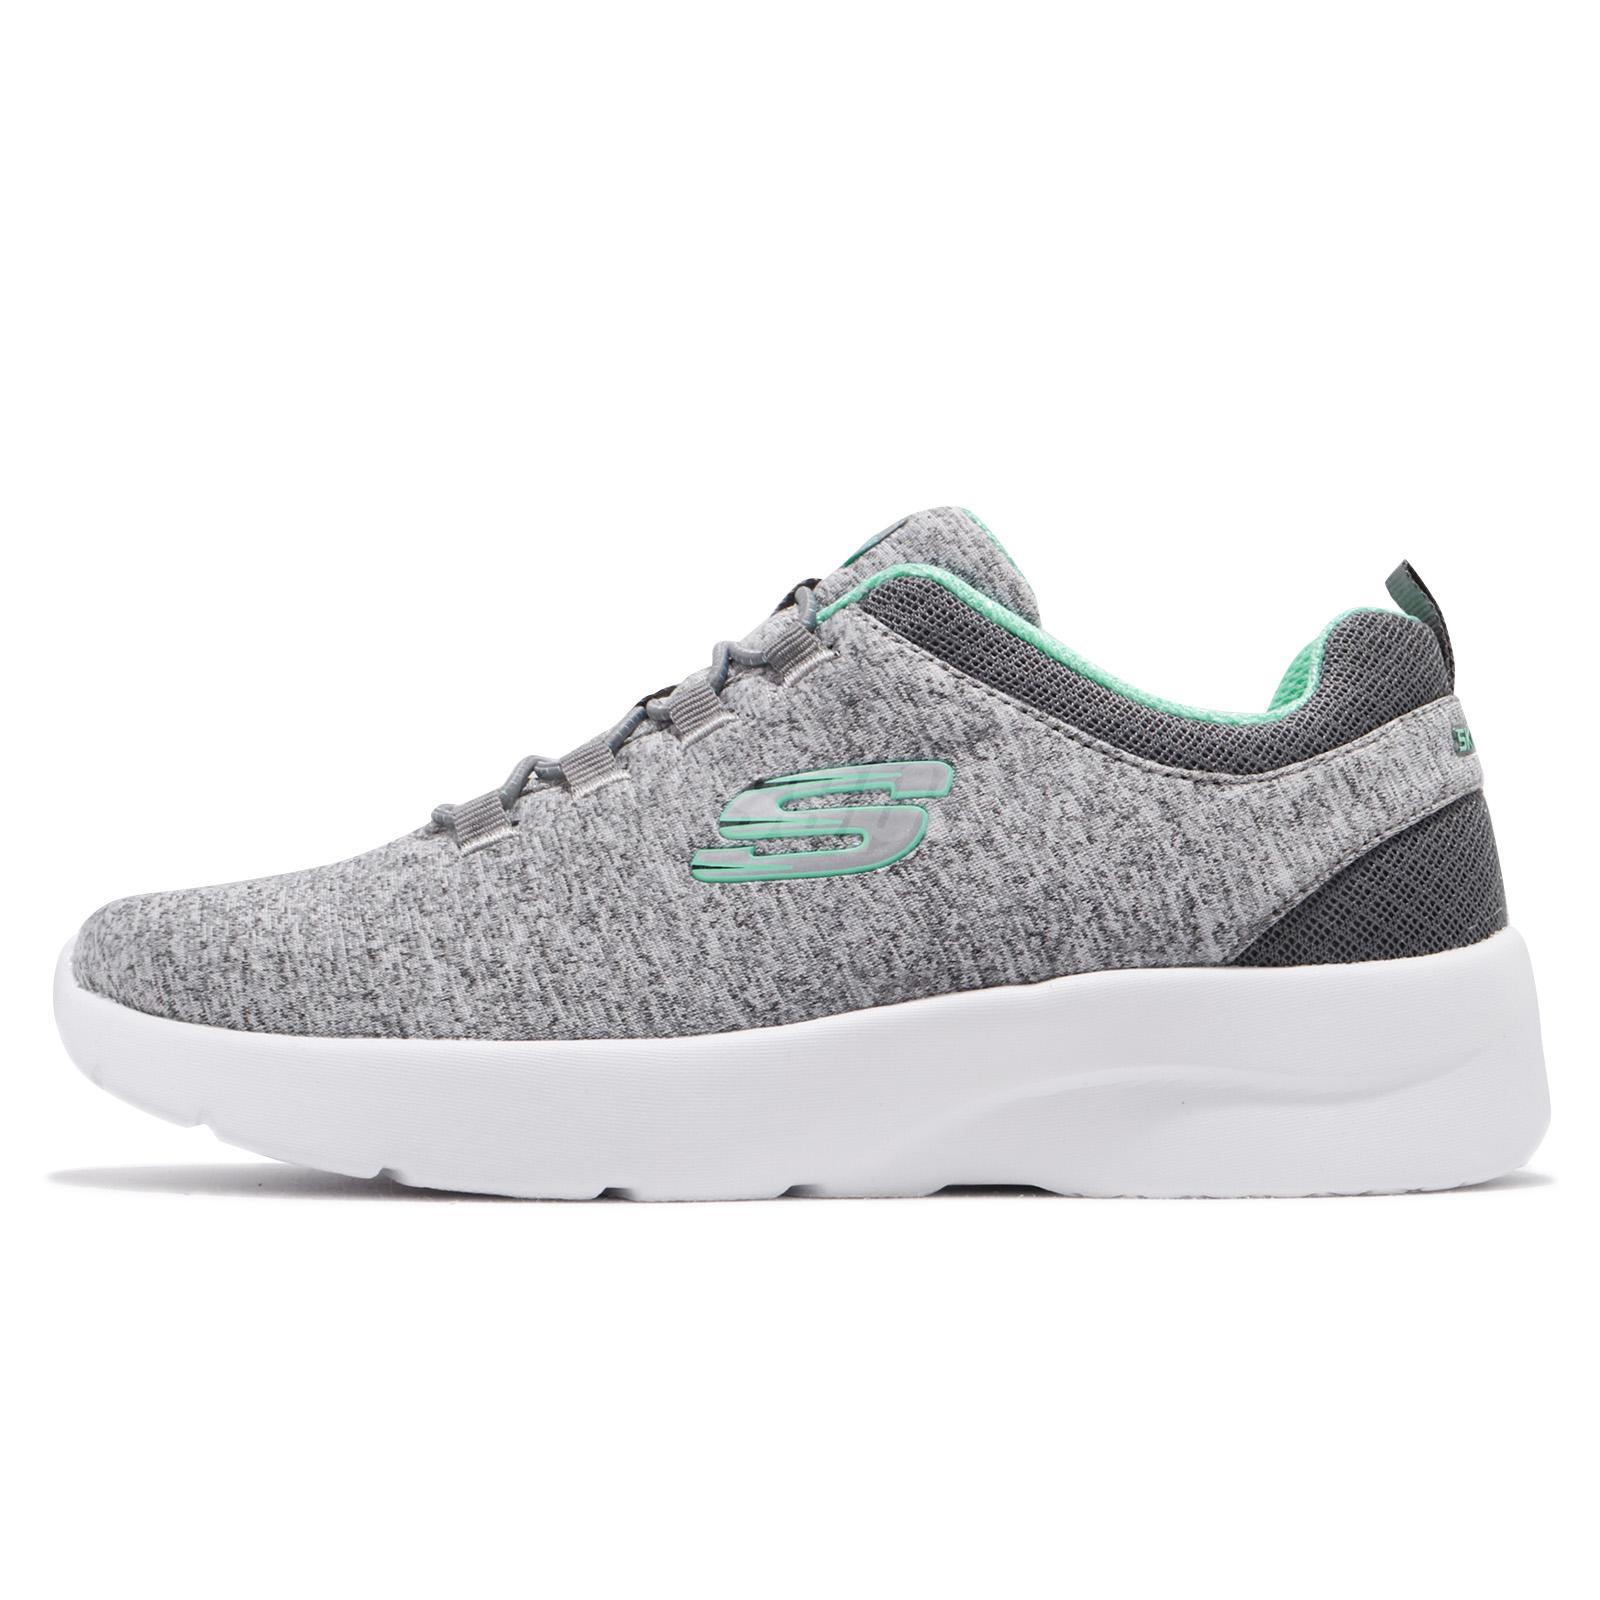 6351818f2f3ff Skechers Dynamight 2.0-In A Flash Grey Mint White Women Running Shoes  12965-GYMN